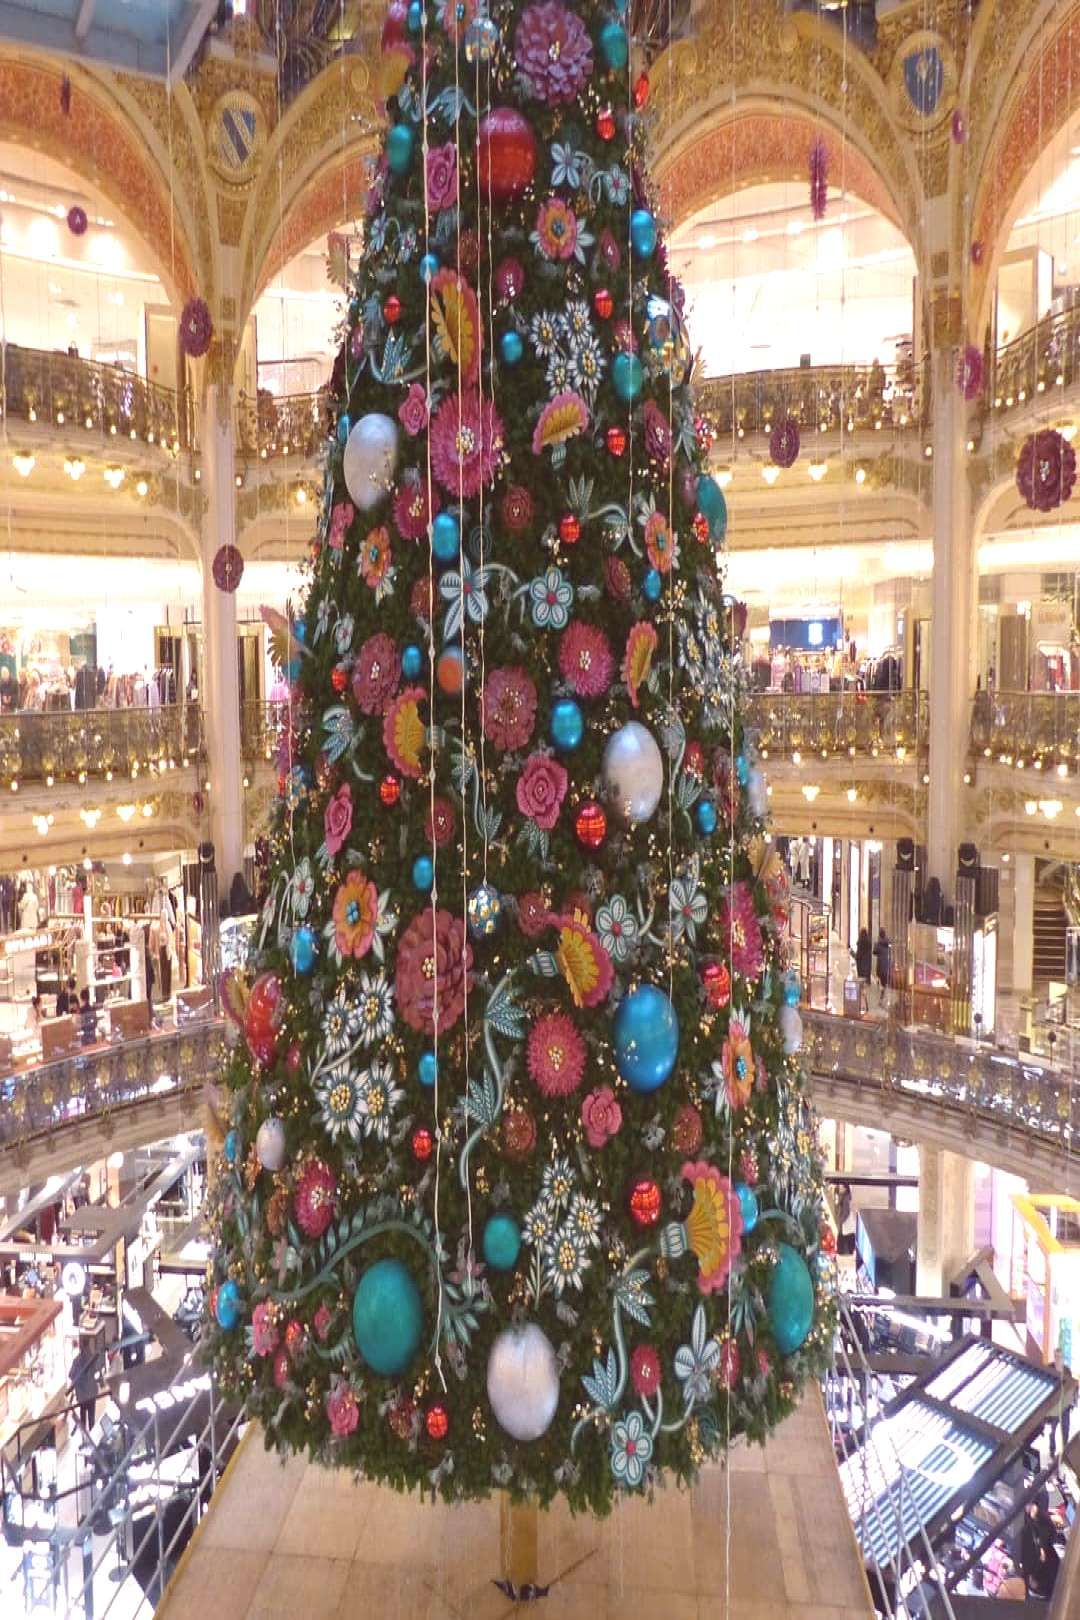 #christmaslights #christmastre #christmas #indoor #paris #tree #and パリ、そぞろ歩き。 #paris #christmaslights #christmastreYou can find Christmas lights and more on our website.パリ、そぞろ歩き。 #paris #christmaslights #christmastre